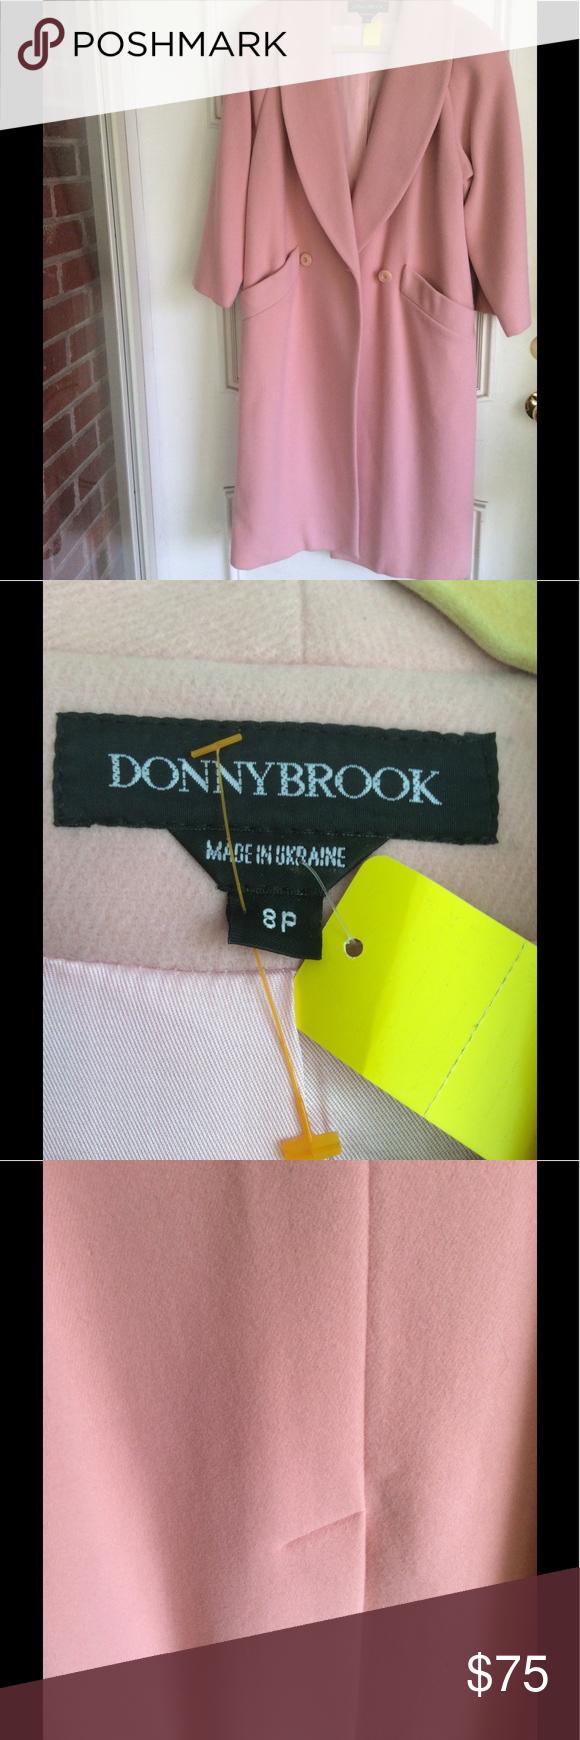 Gorgeous Pink Dress Coat Offers Welcome Wool Elegant Classic Donnybrook Jackets Coats Pink Dress Coat Dress